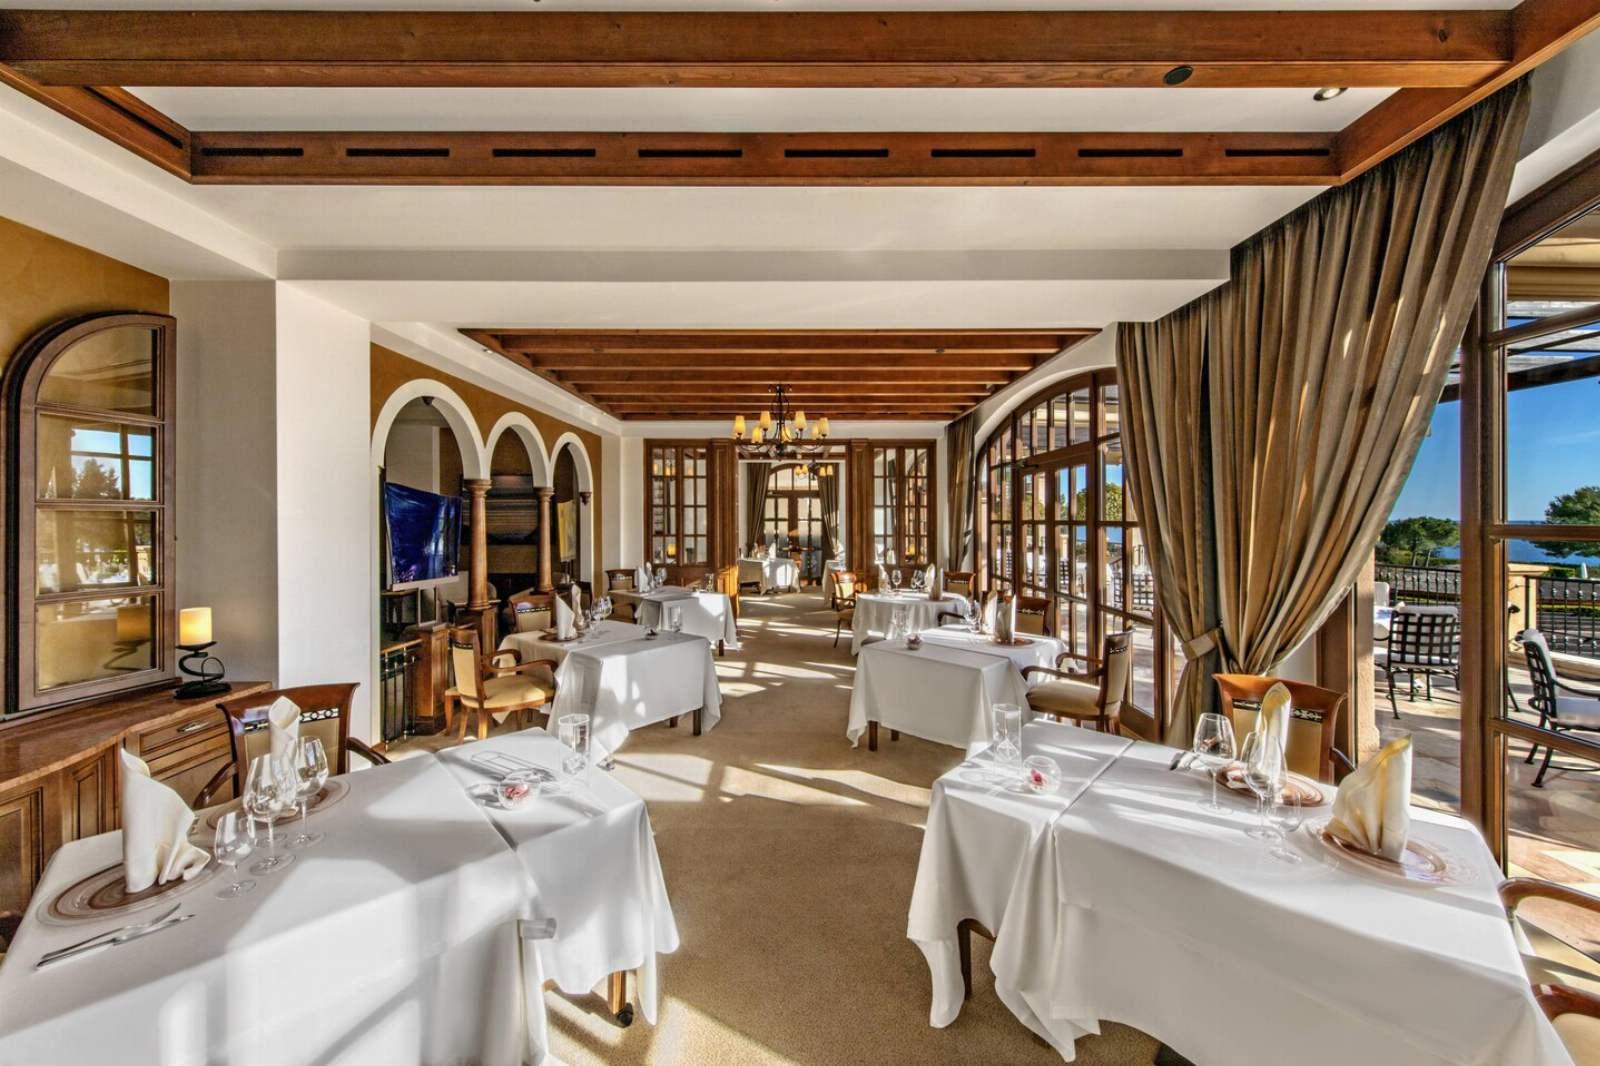 St. Regis Mardavall Resort - Restaurant Es Fum